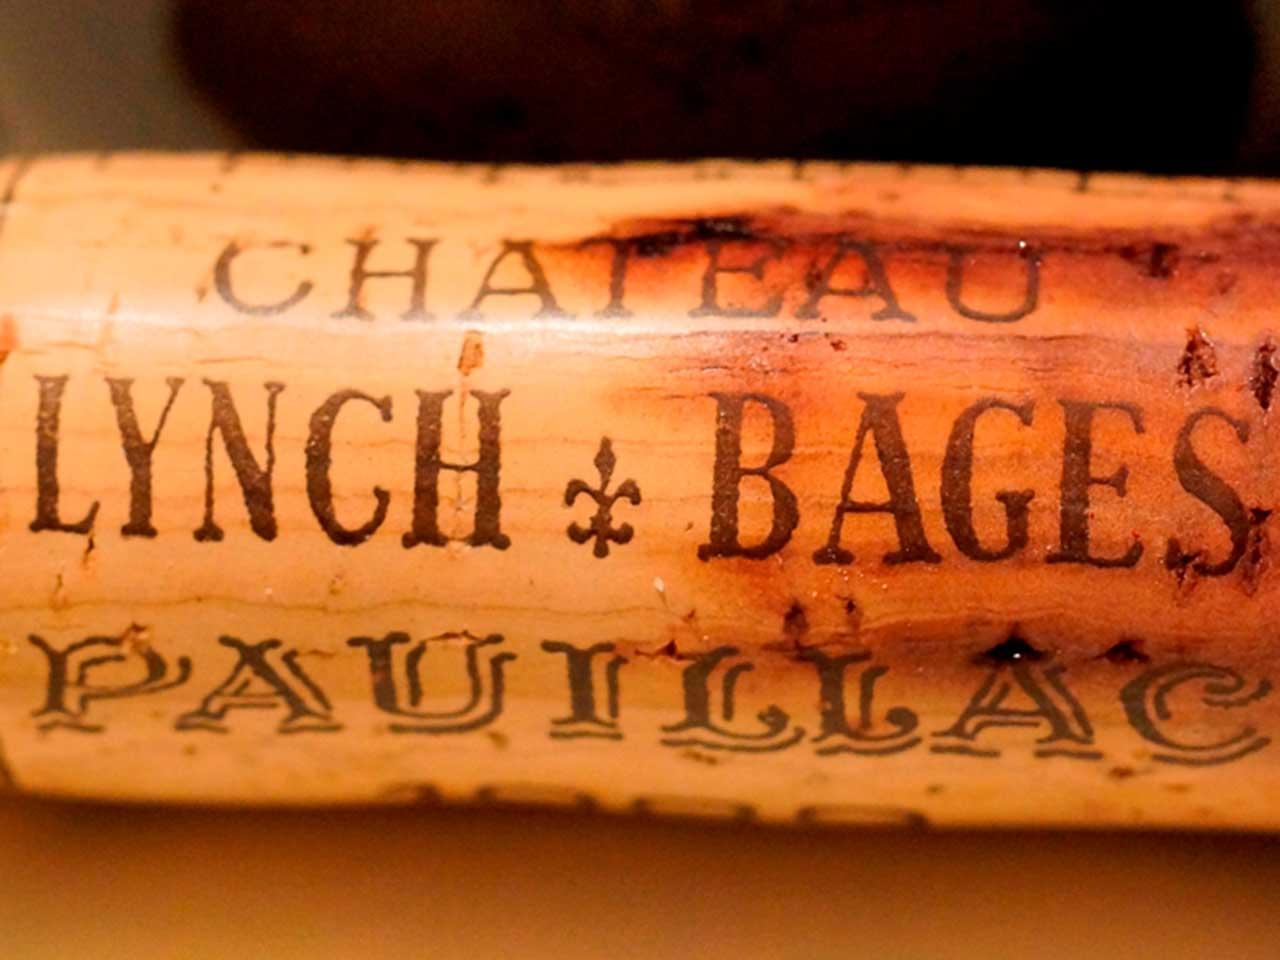 1989-chateau-lynch-bages-2-1280x960